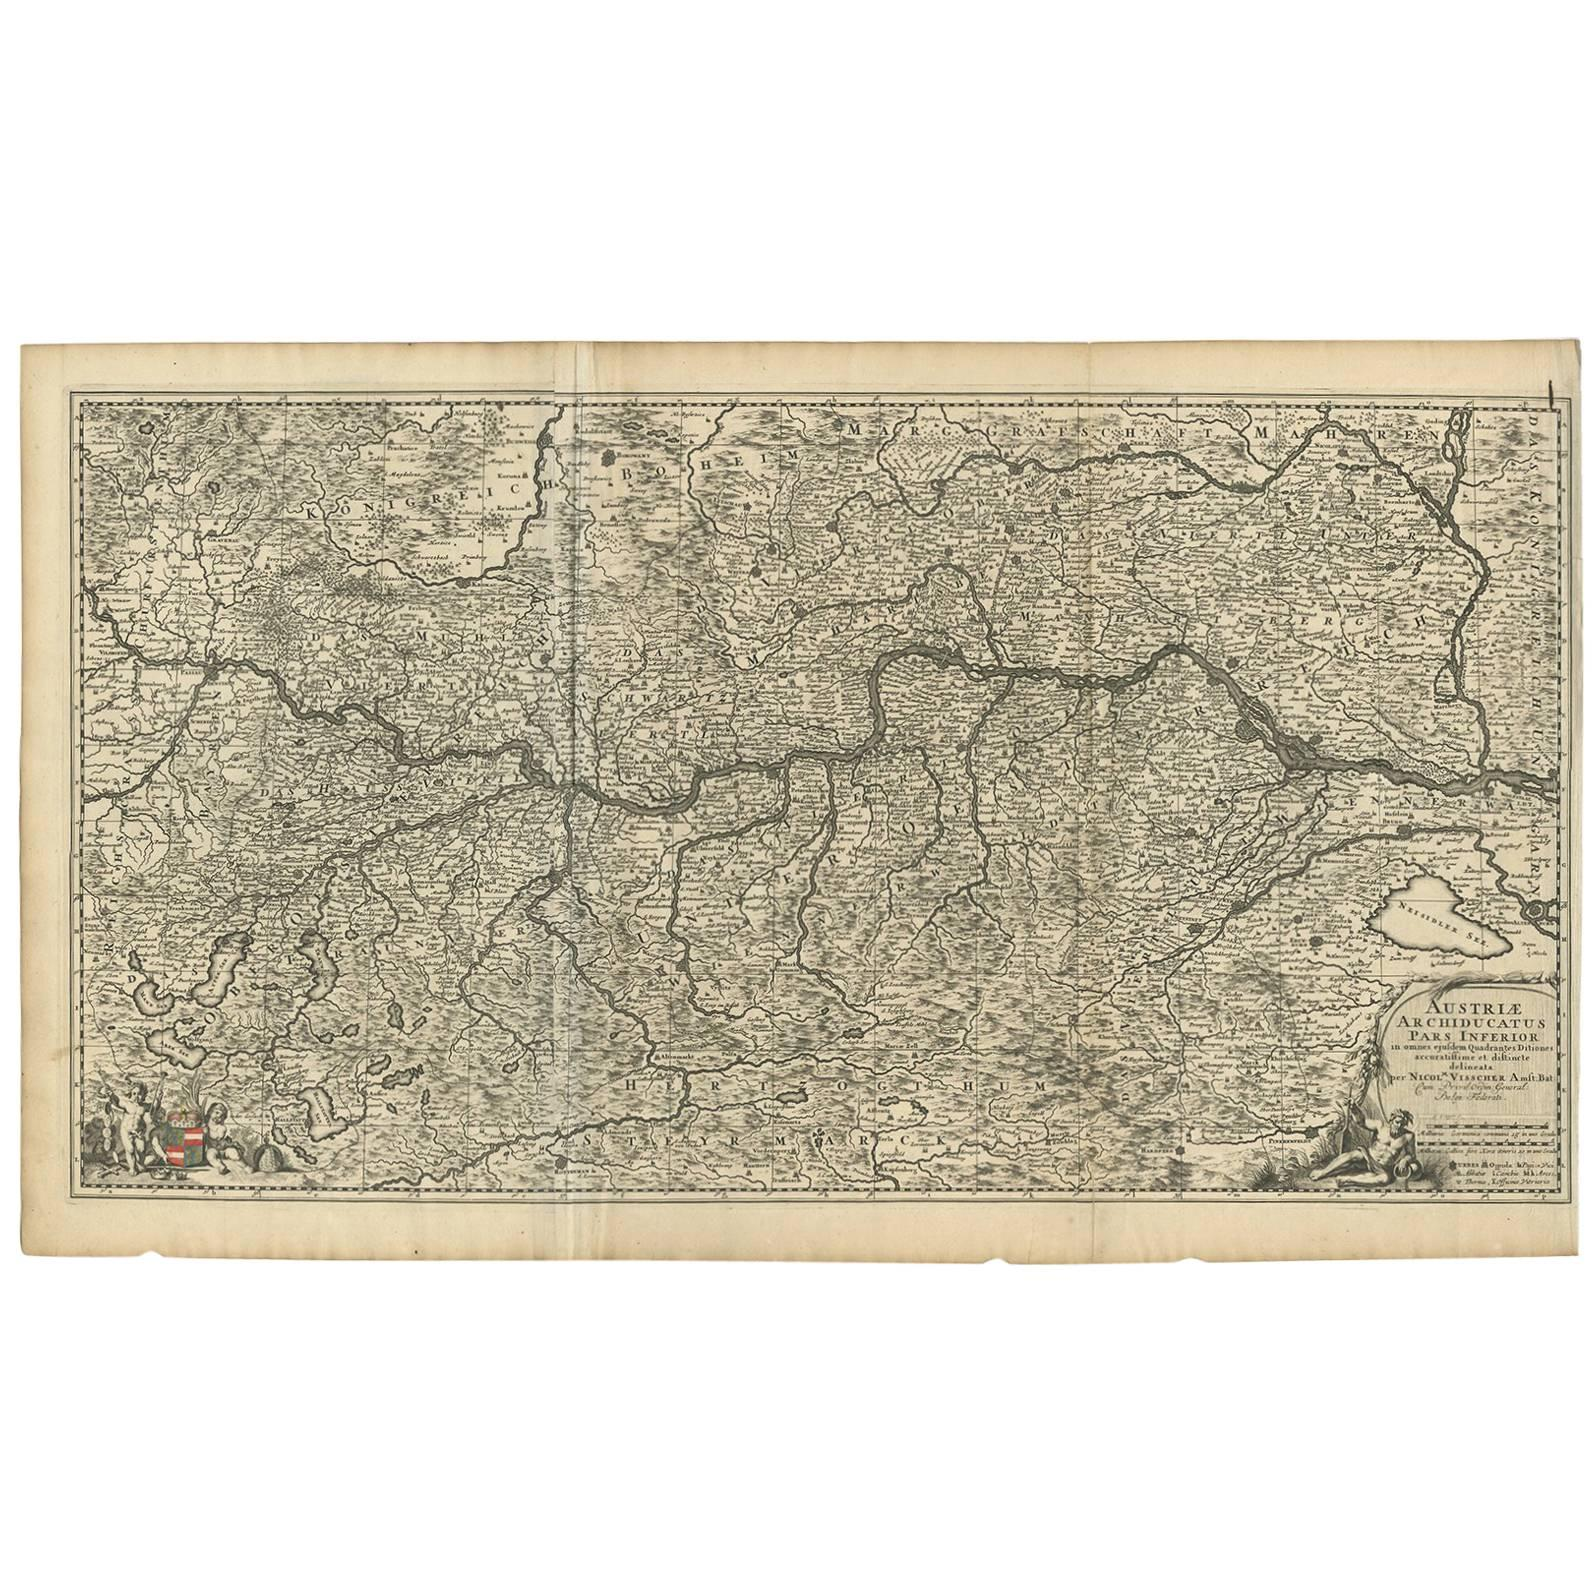 Antique Map of Austria by N. Visscher, circa 1690